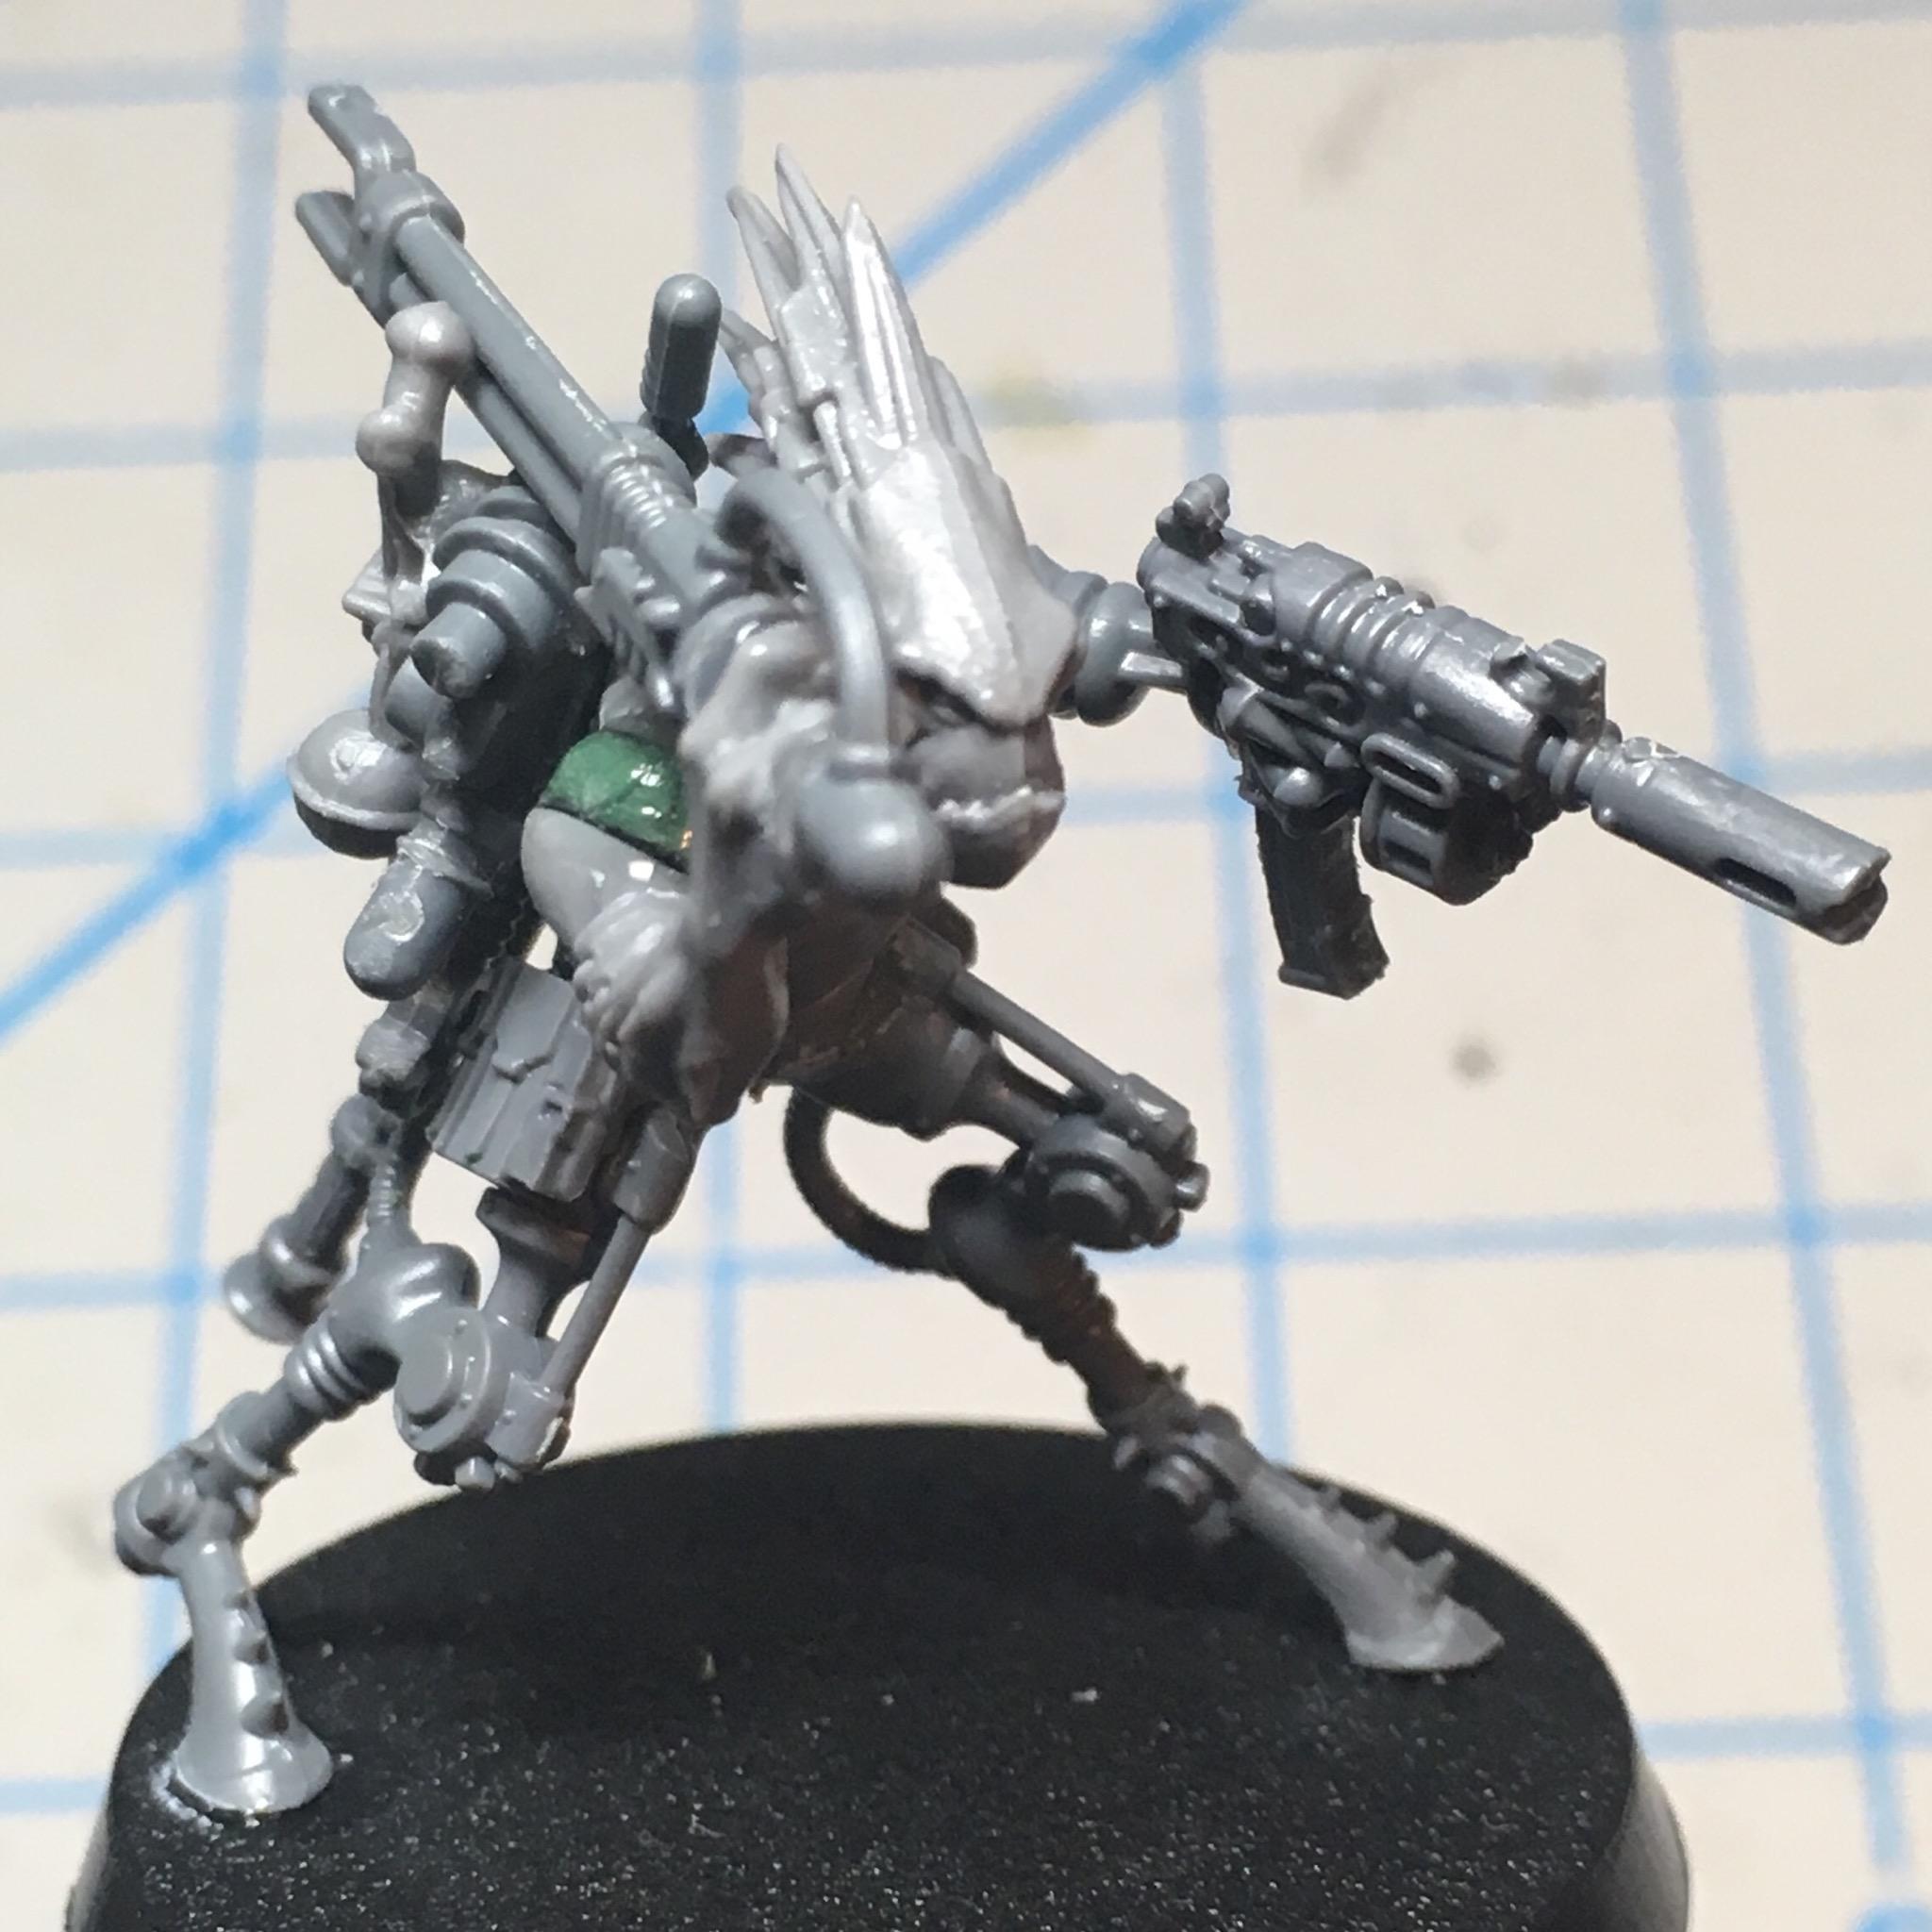 Conversion, Coubts-as, Knarloc, Kroot, Kroot Mercenaries, Mercenary, Renegades, Tau, Work In Progress